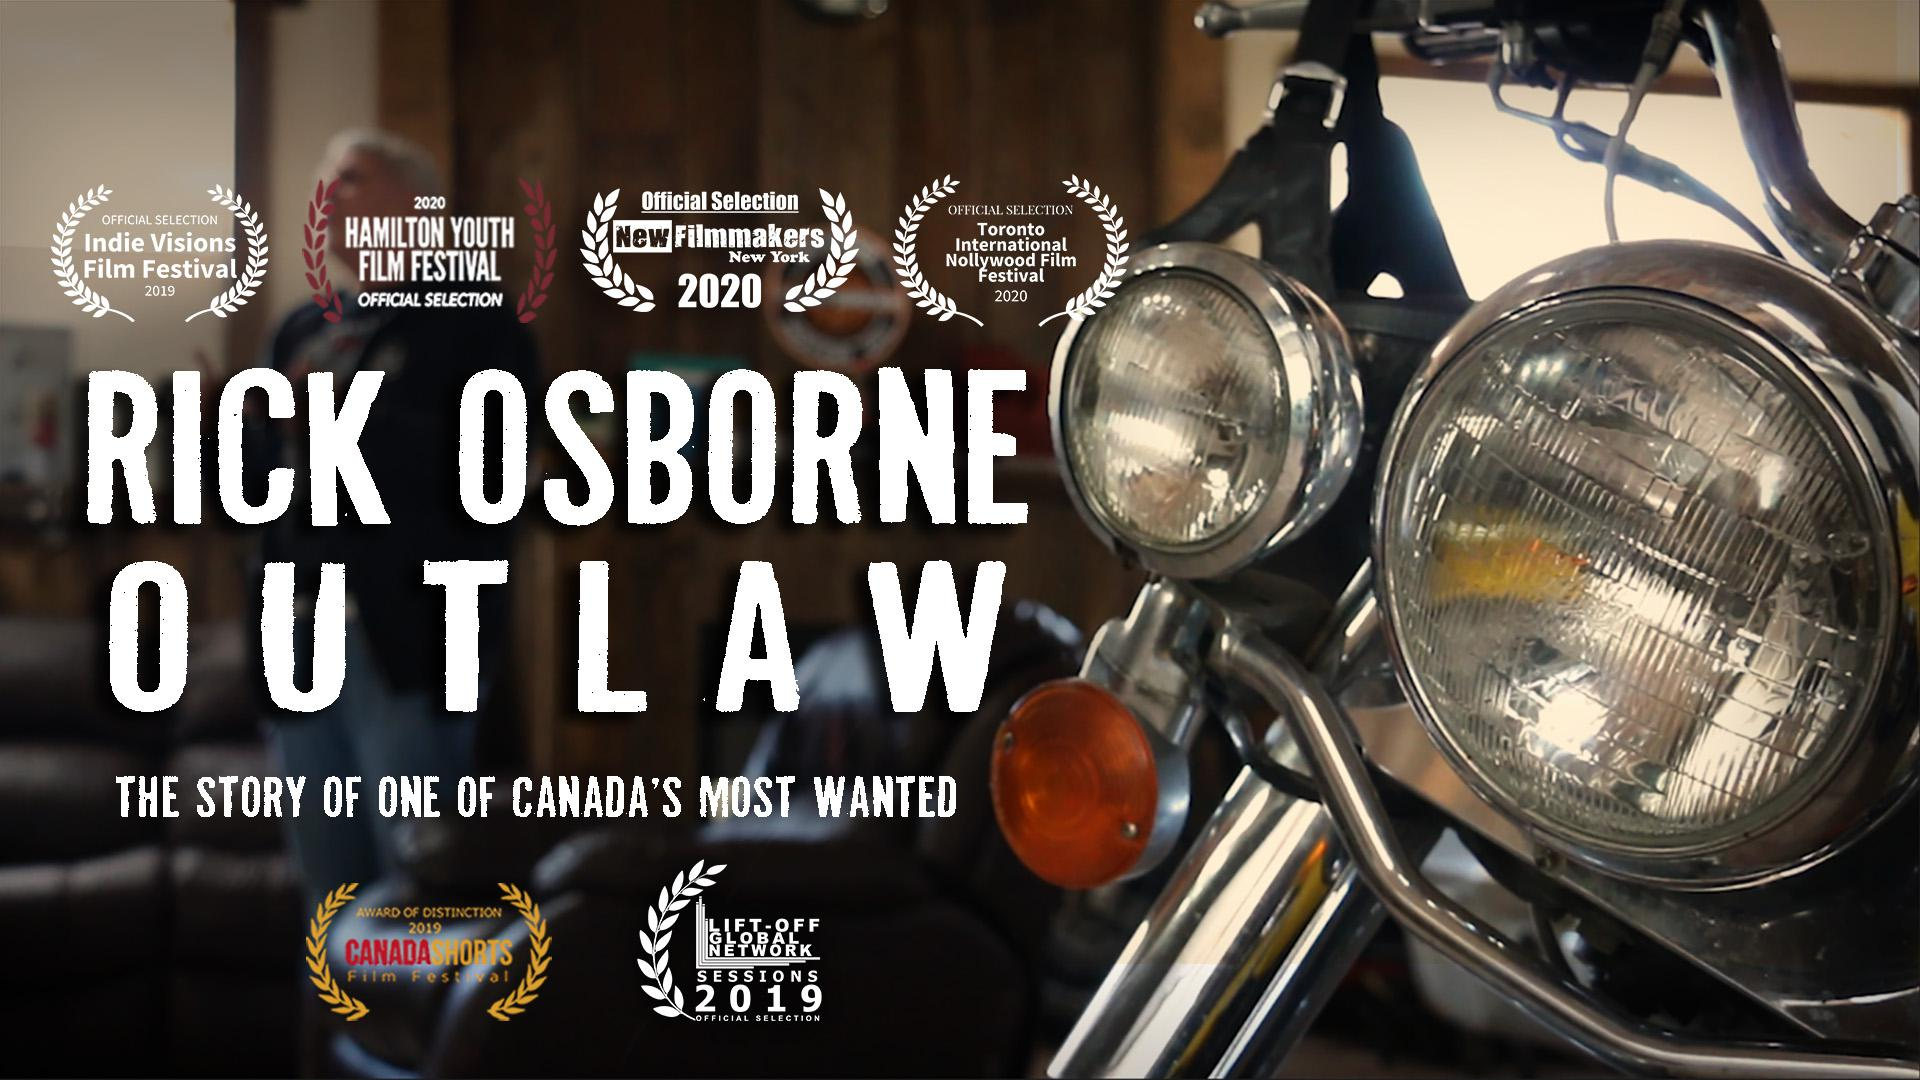 Rick Osborne: Outlaw